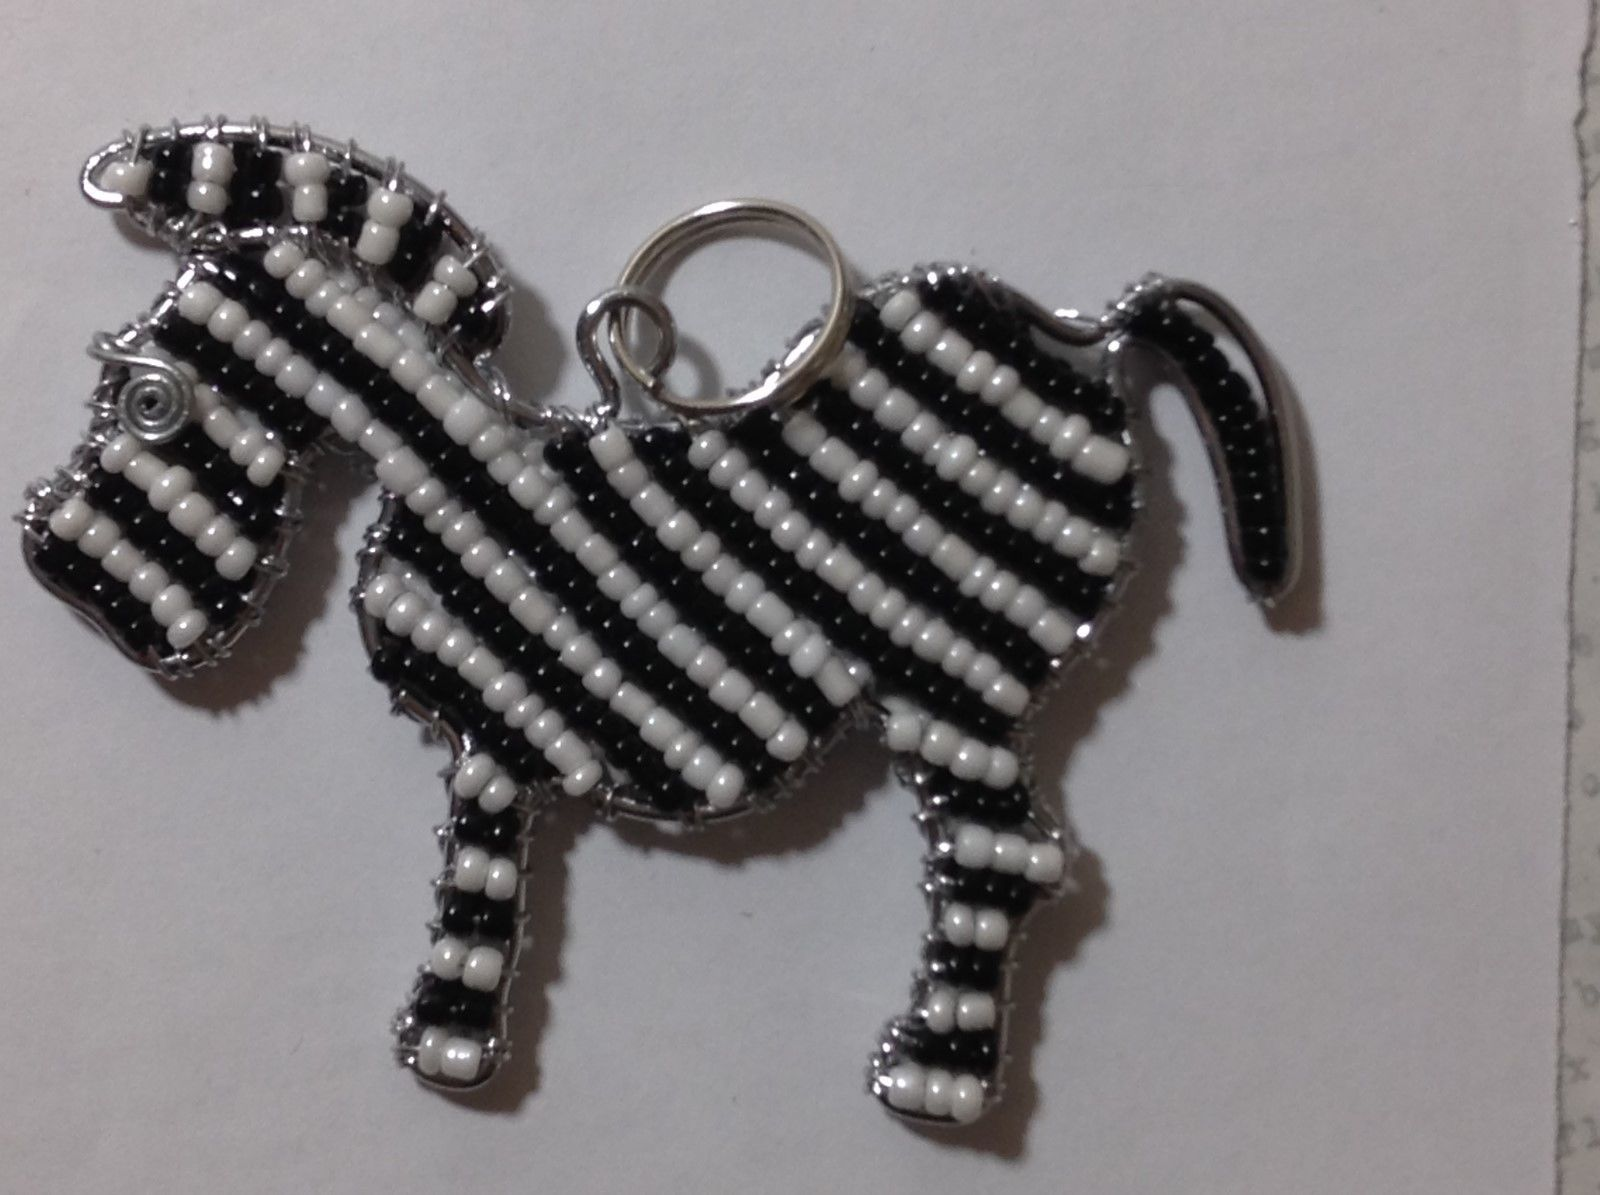 NEW Hand Beaded Black and White Zebra Key Chain